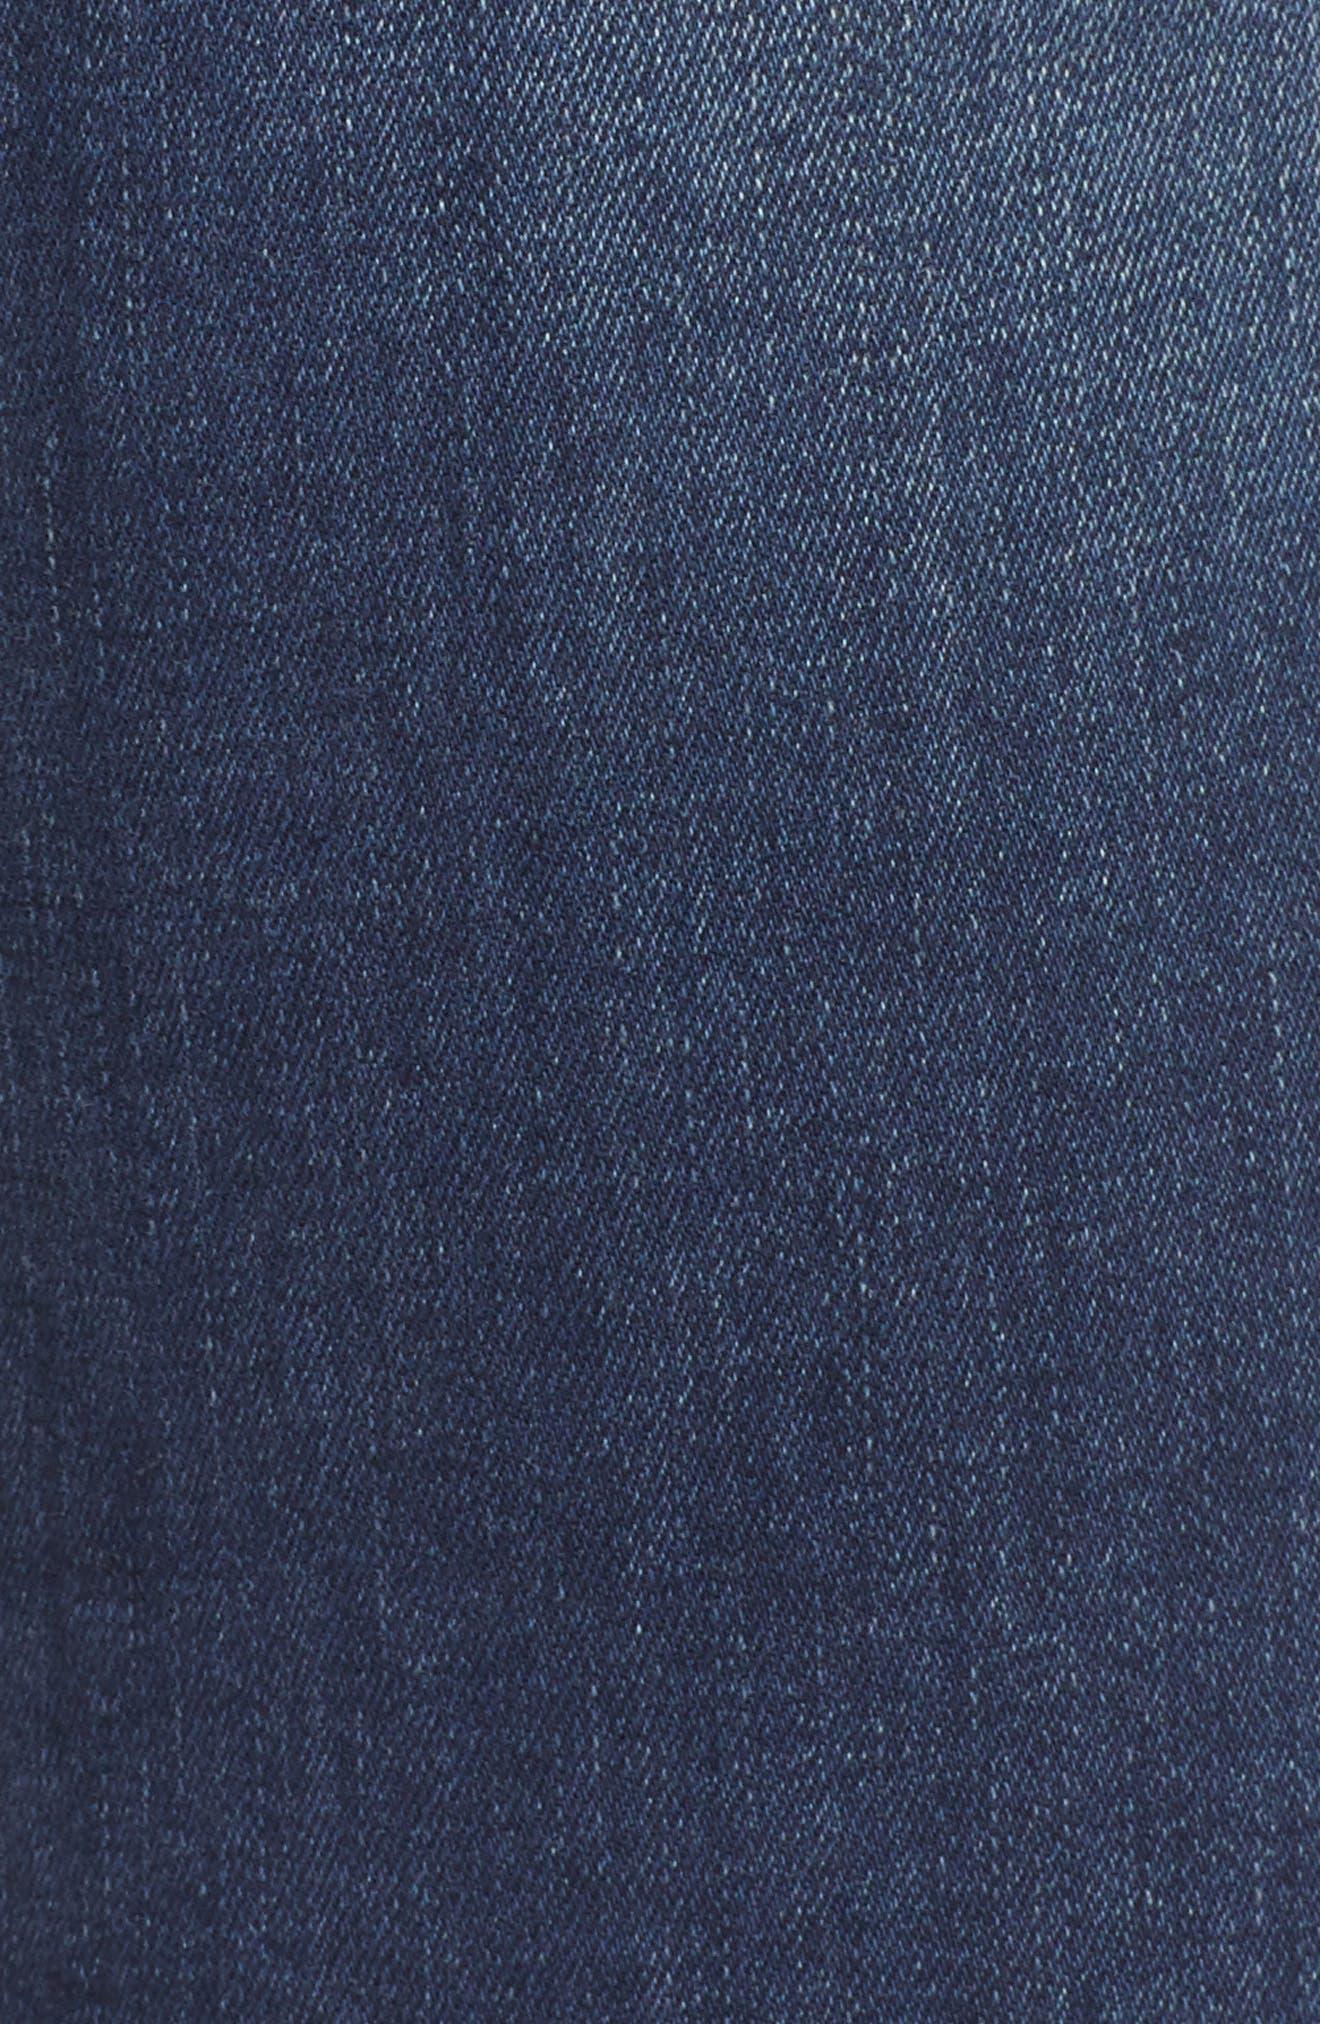 Santana High Waist Skinny Jeans,                             Alternate thumbnail 6, color,                             NEDDLE DARK BLUE STRETCH